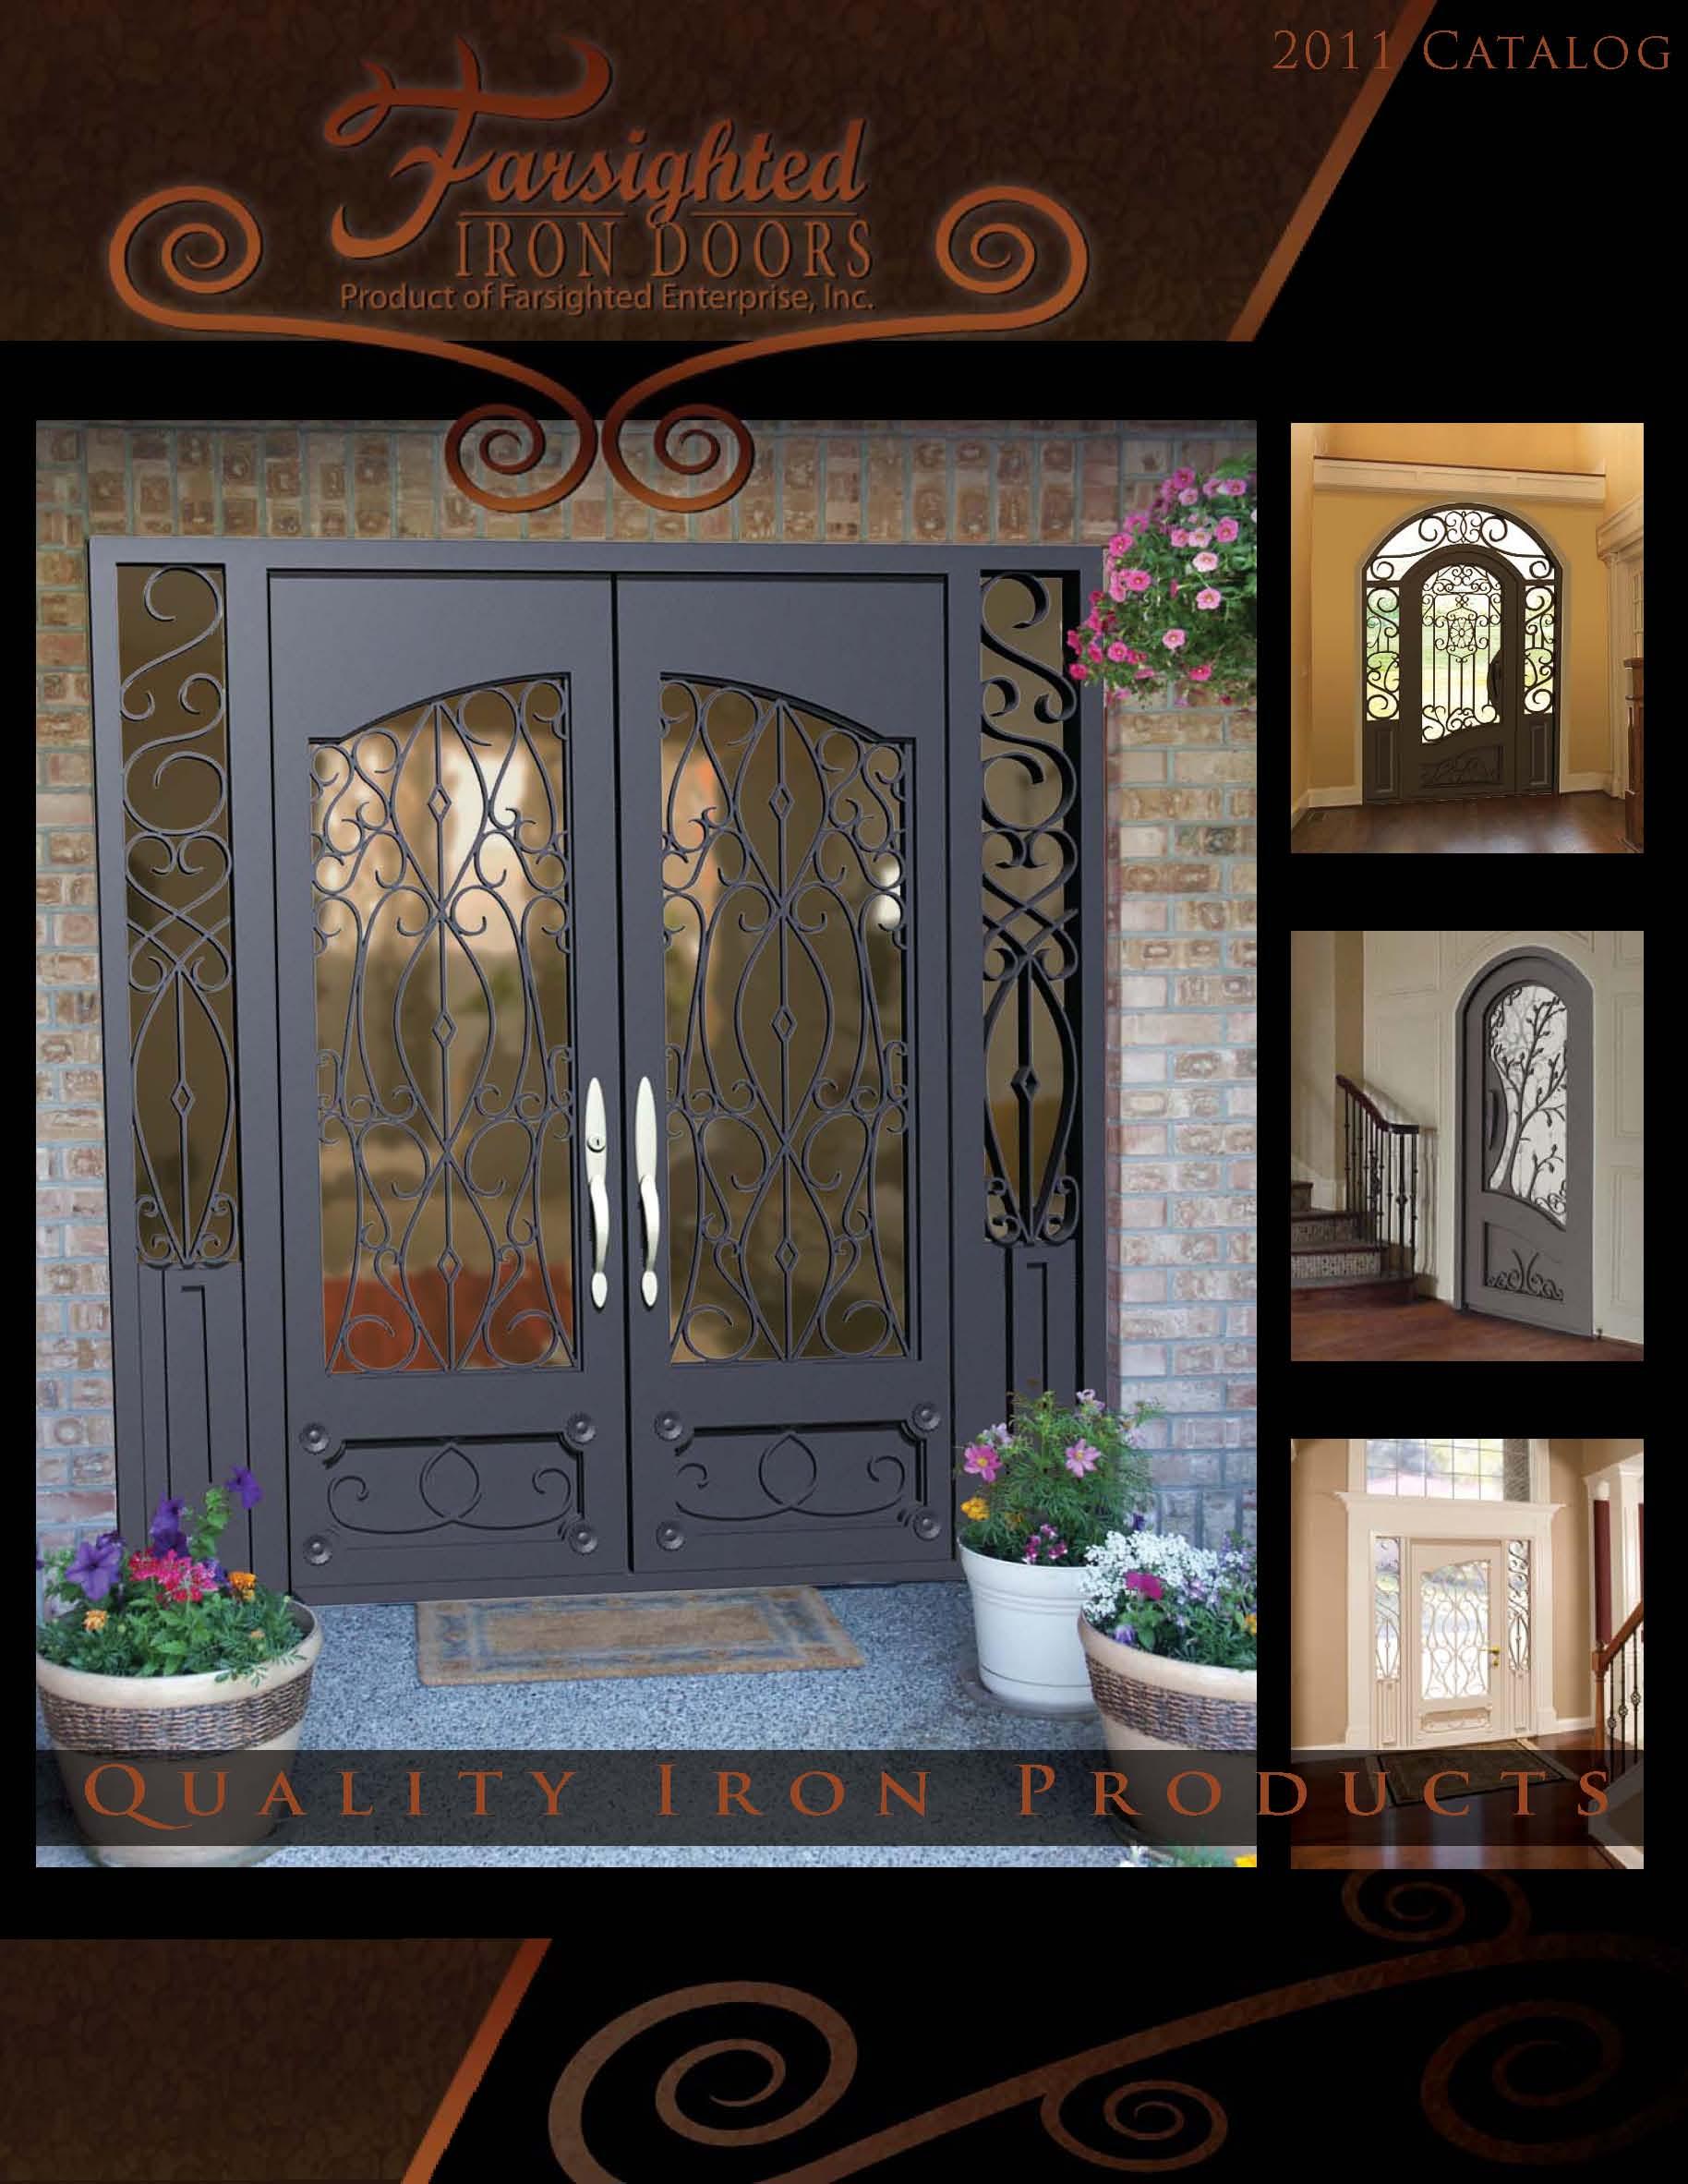 Iron doors from Value Windows and Doors